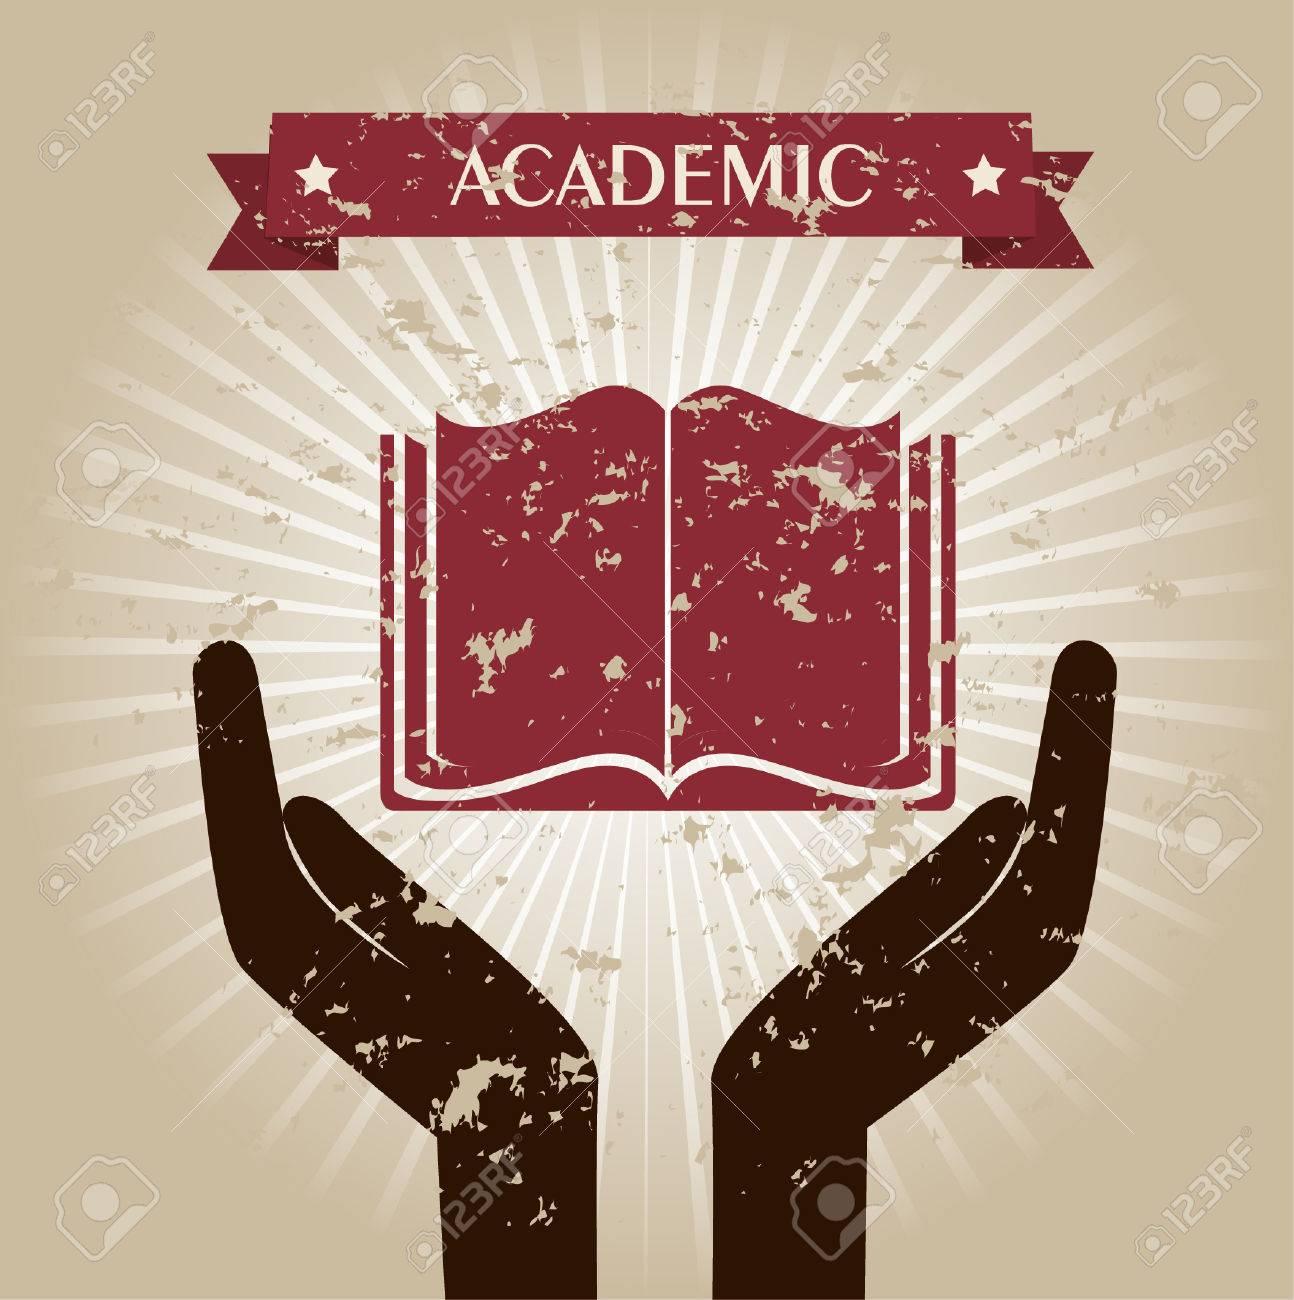 academic design over beige background vector illustration Stock Vector - 22266778